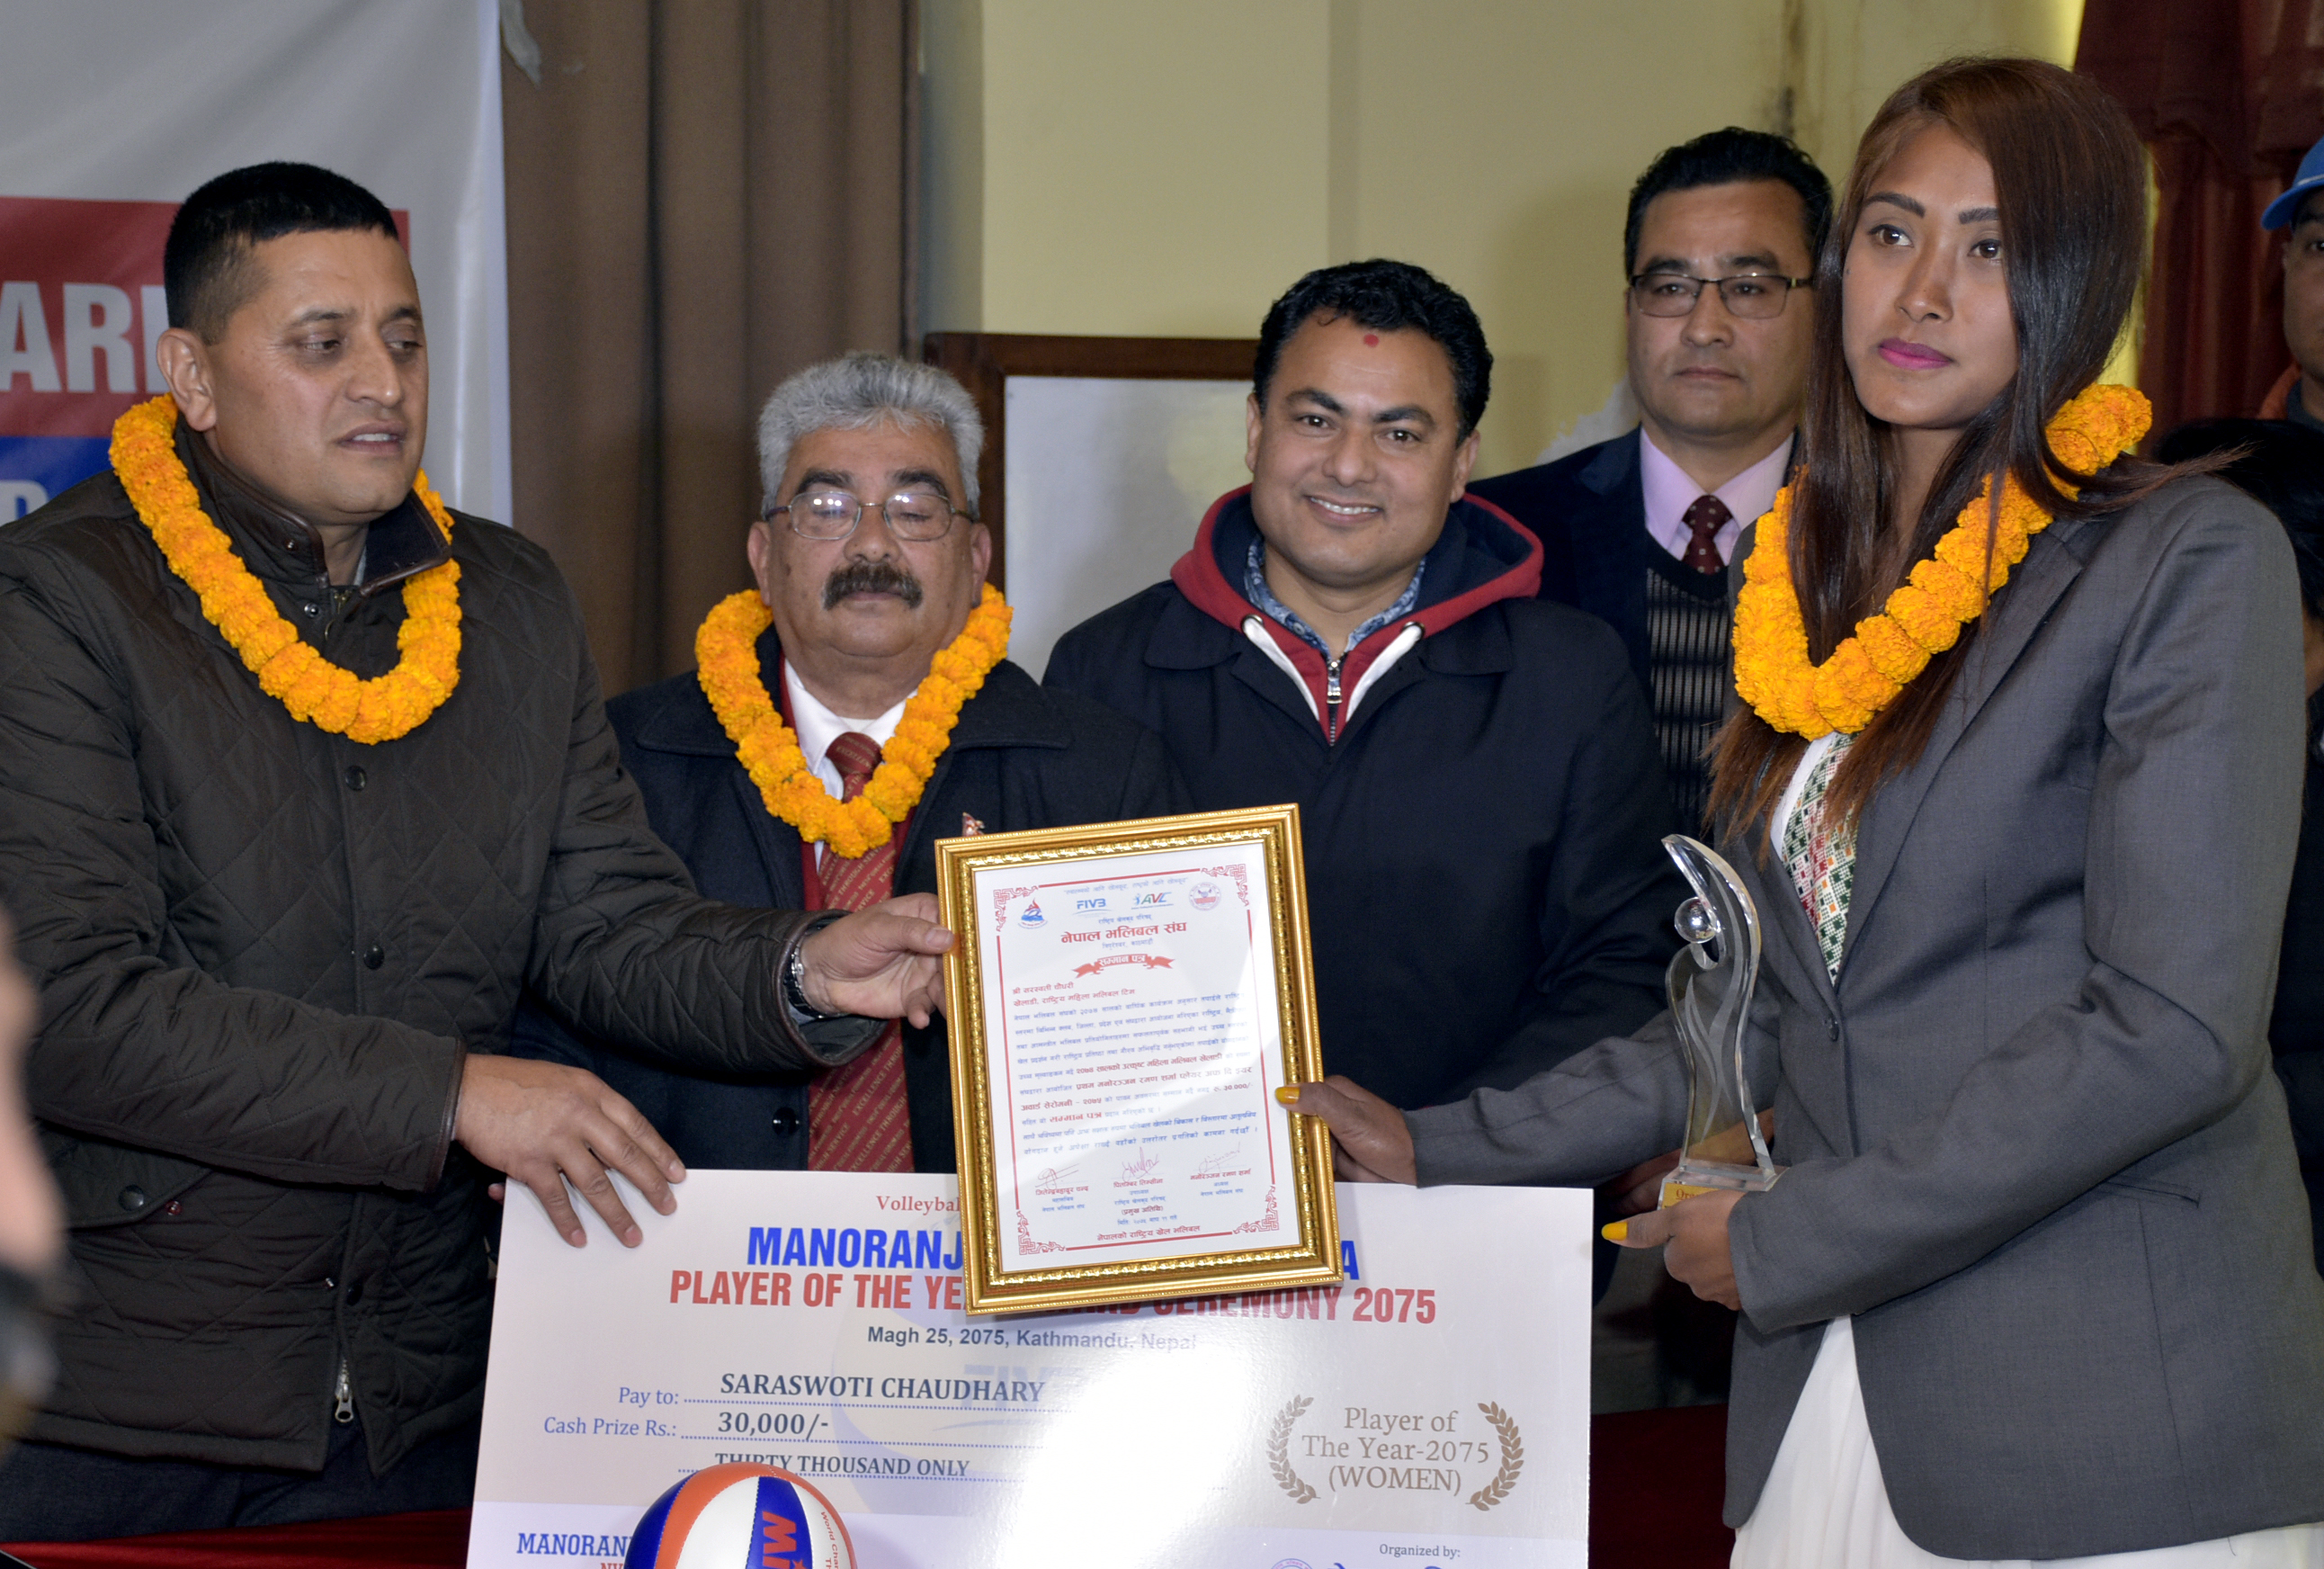 Nepal APF Clubu2019s Saraswoti Chaudhary receiving the Manoranjan Raman Sharma Player of the Year Award  in Kathmandu on Friday, February 8, 2019. Photo: THT